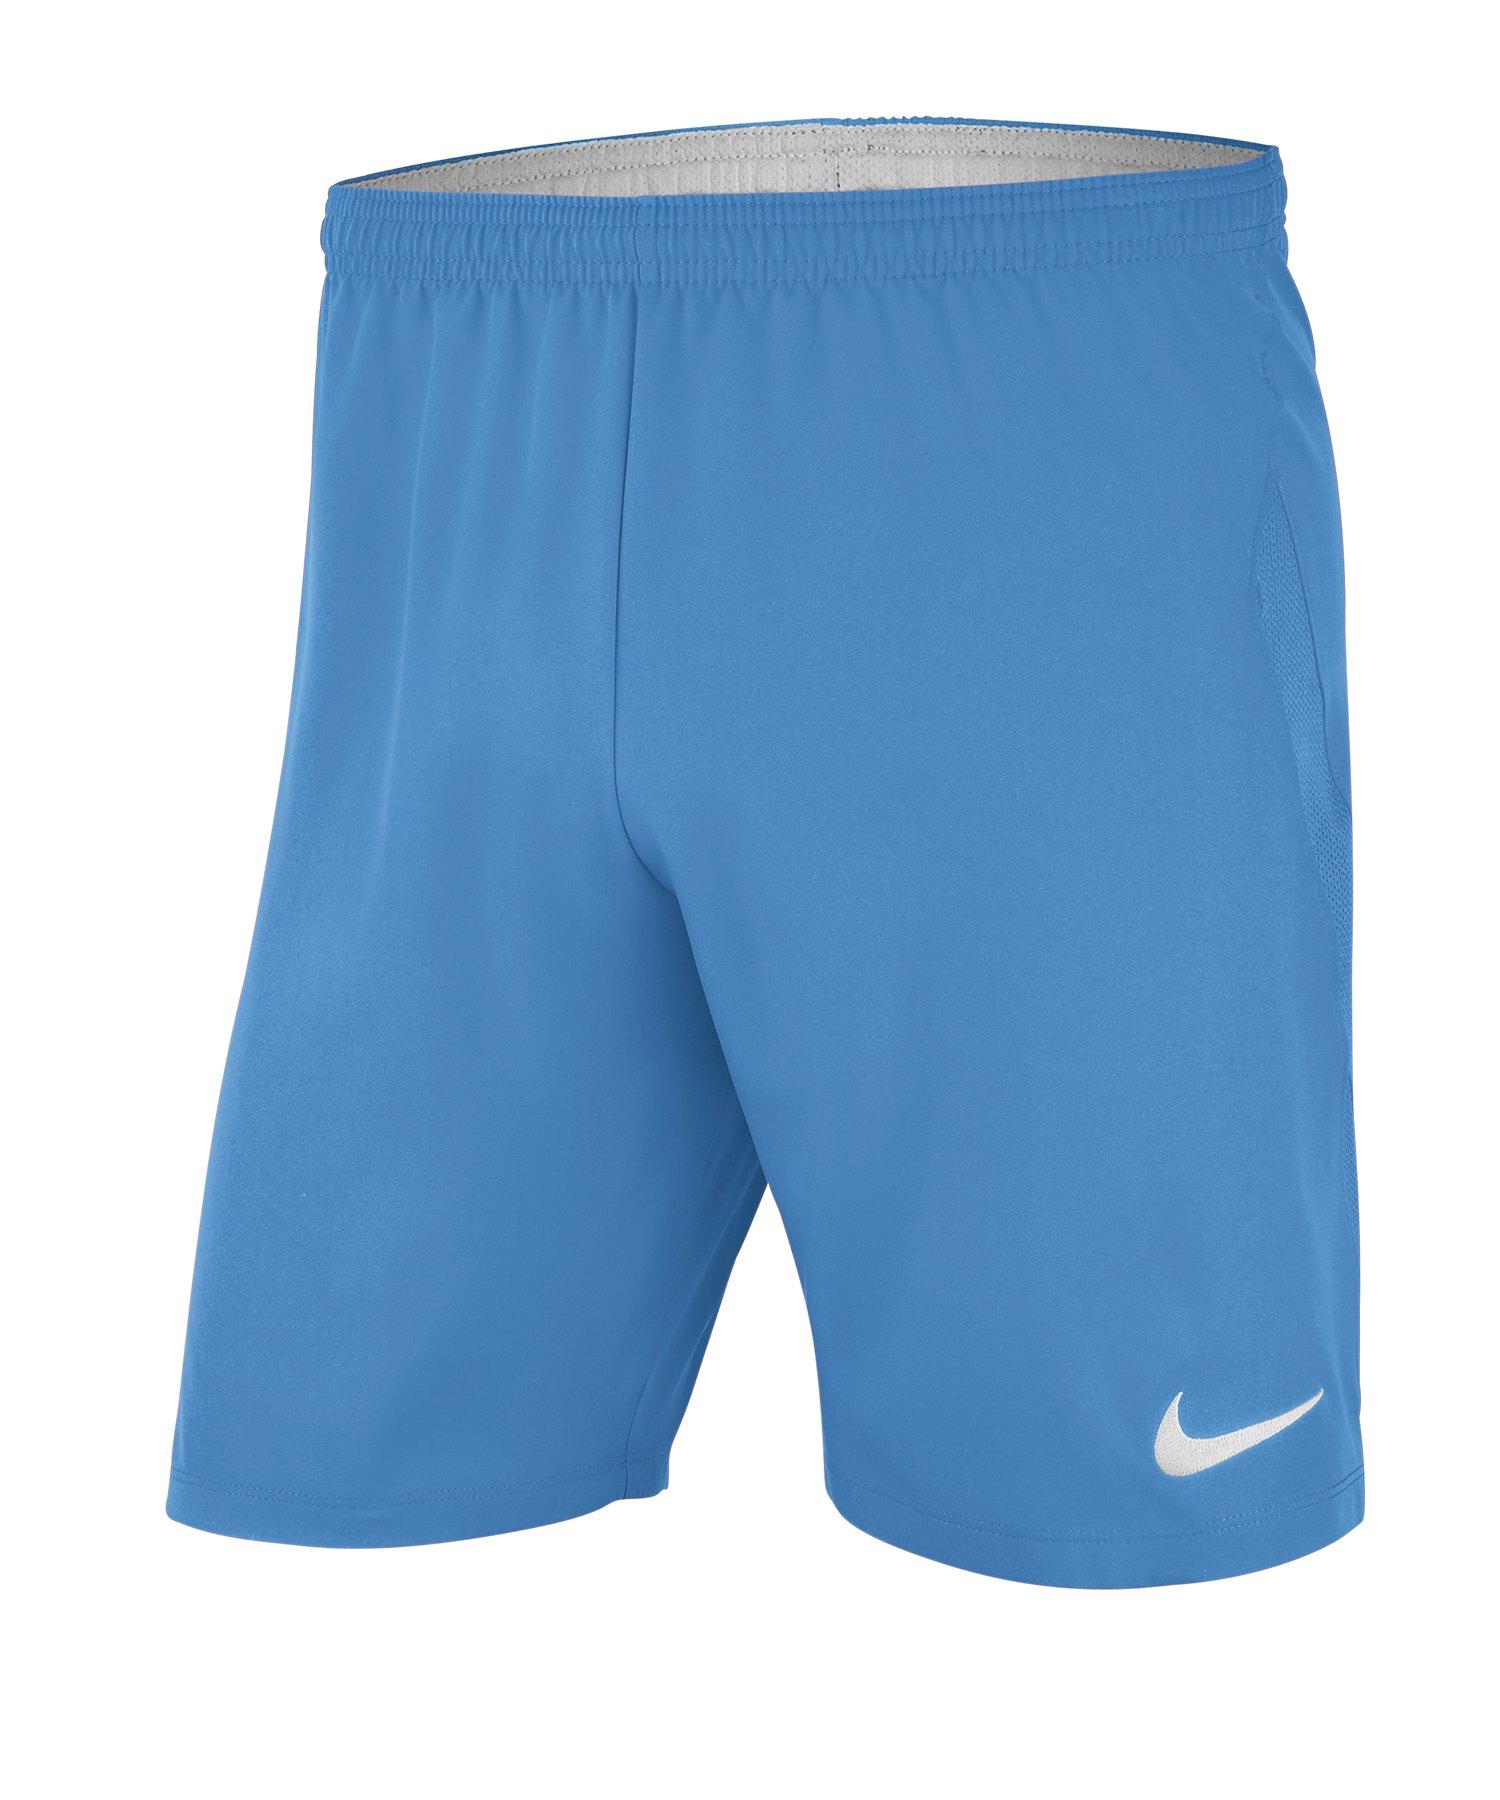 Nike Laser IV Dri-FIT Short Kids Blau F412 - blau